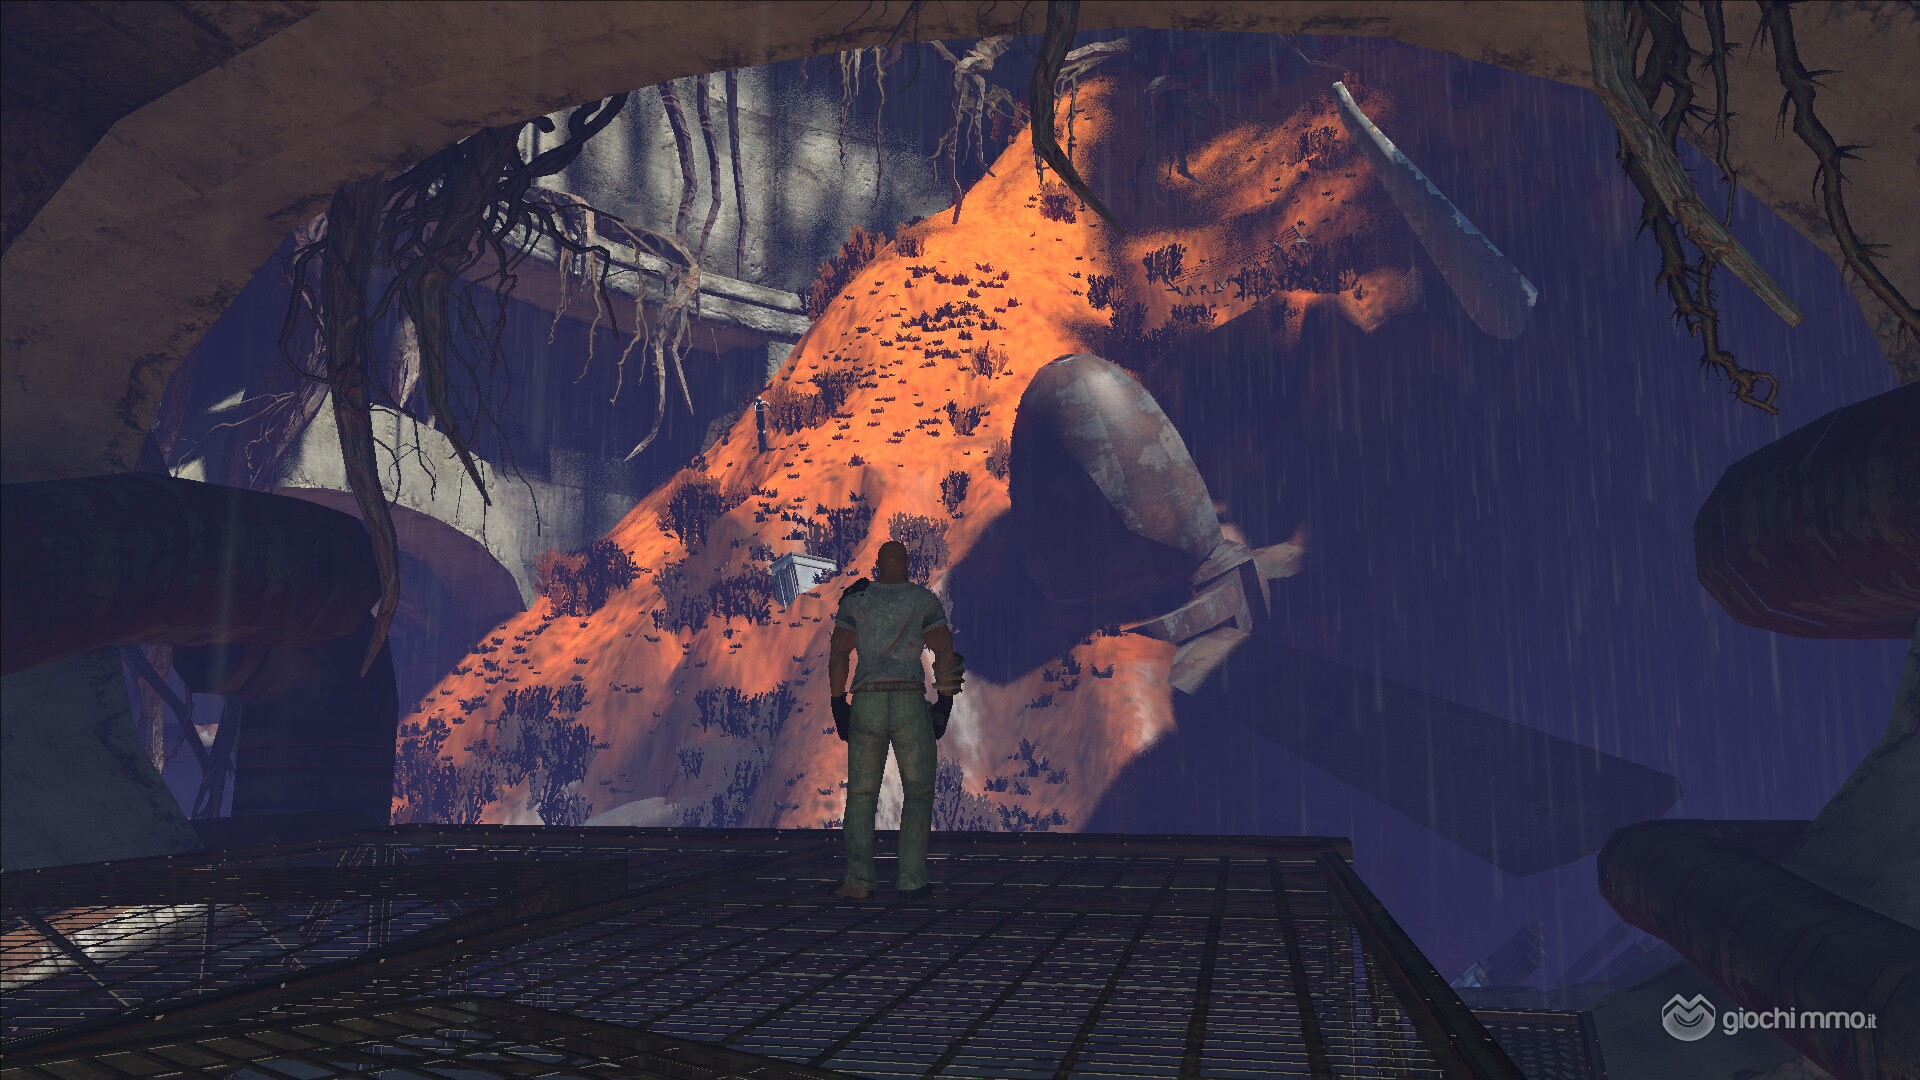 Clicca sull'immagine per ingrandirlaNome:   Grimlands screen6.jpgVisite: 128Dimensione:   462.0 KBID: 8378